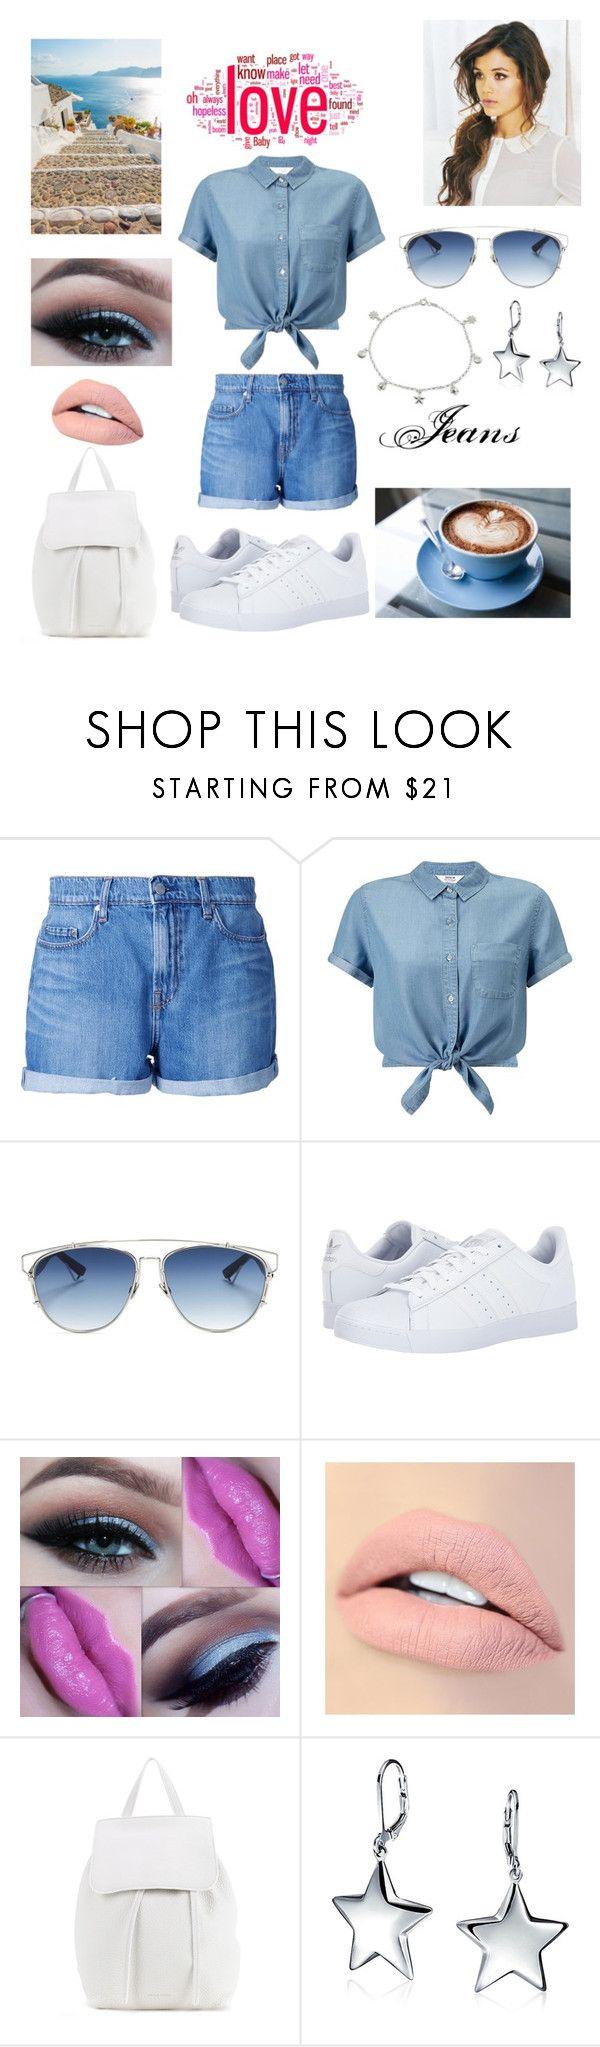 """short jeans"" by blerina-ylli on Polyvore featuring Nobody Denim, Miss Selfridge, Christian Dior, adidas, Jouer, Mansur Gavriel and Giani Bernini"